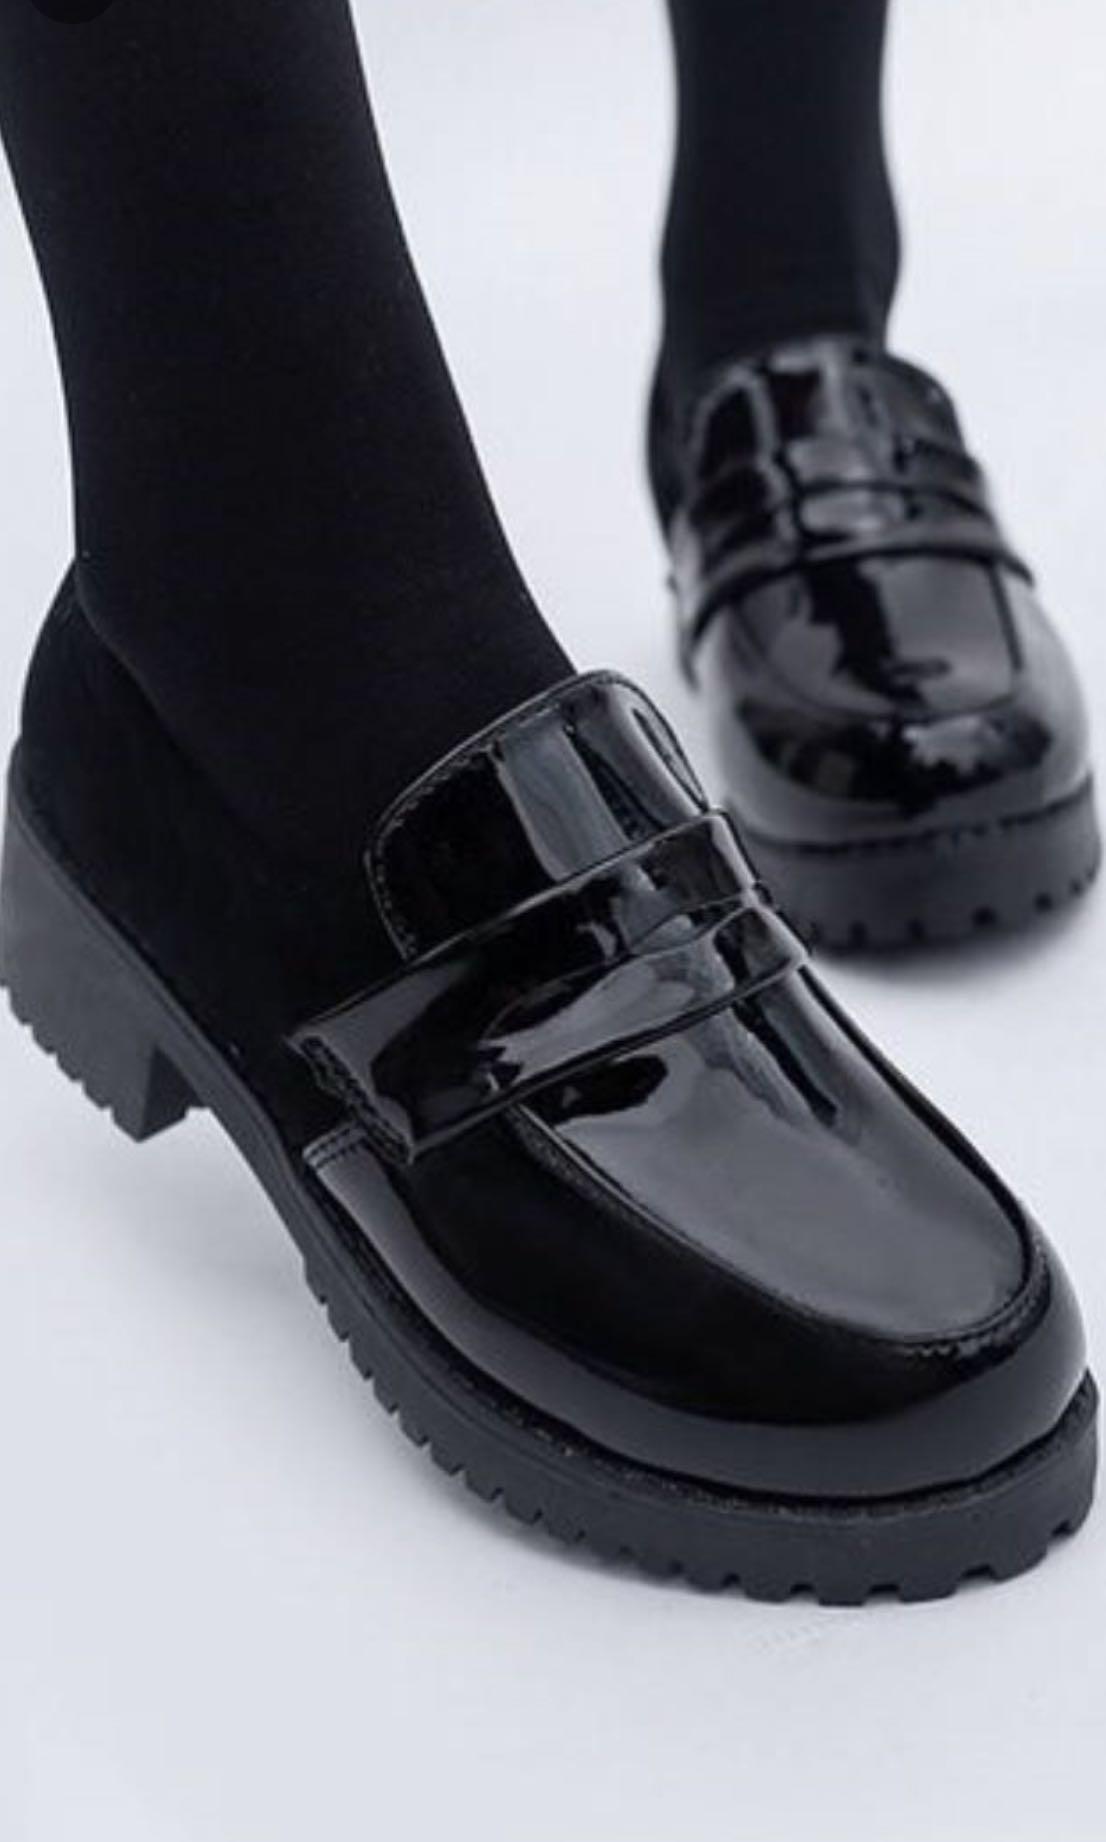 WTS Black Japanese school shoes, Women